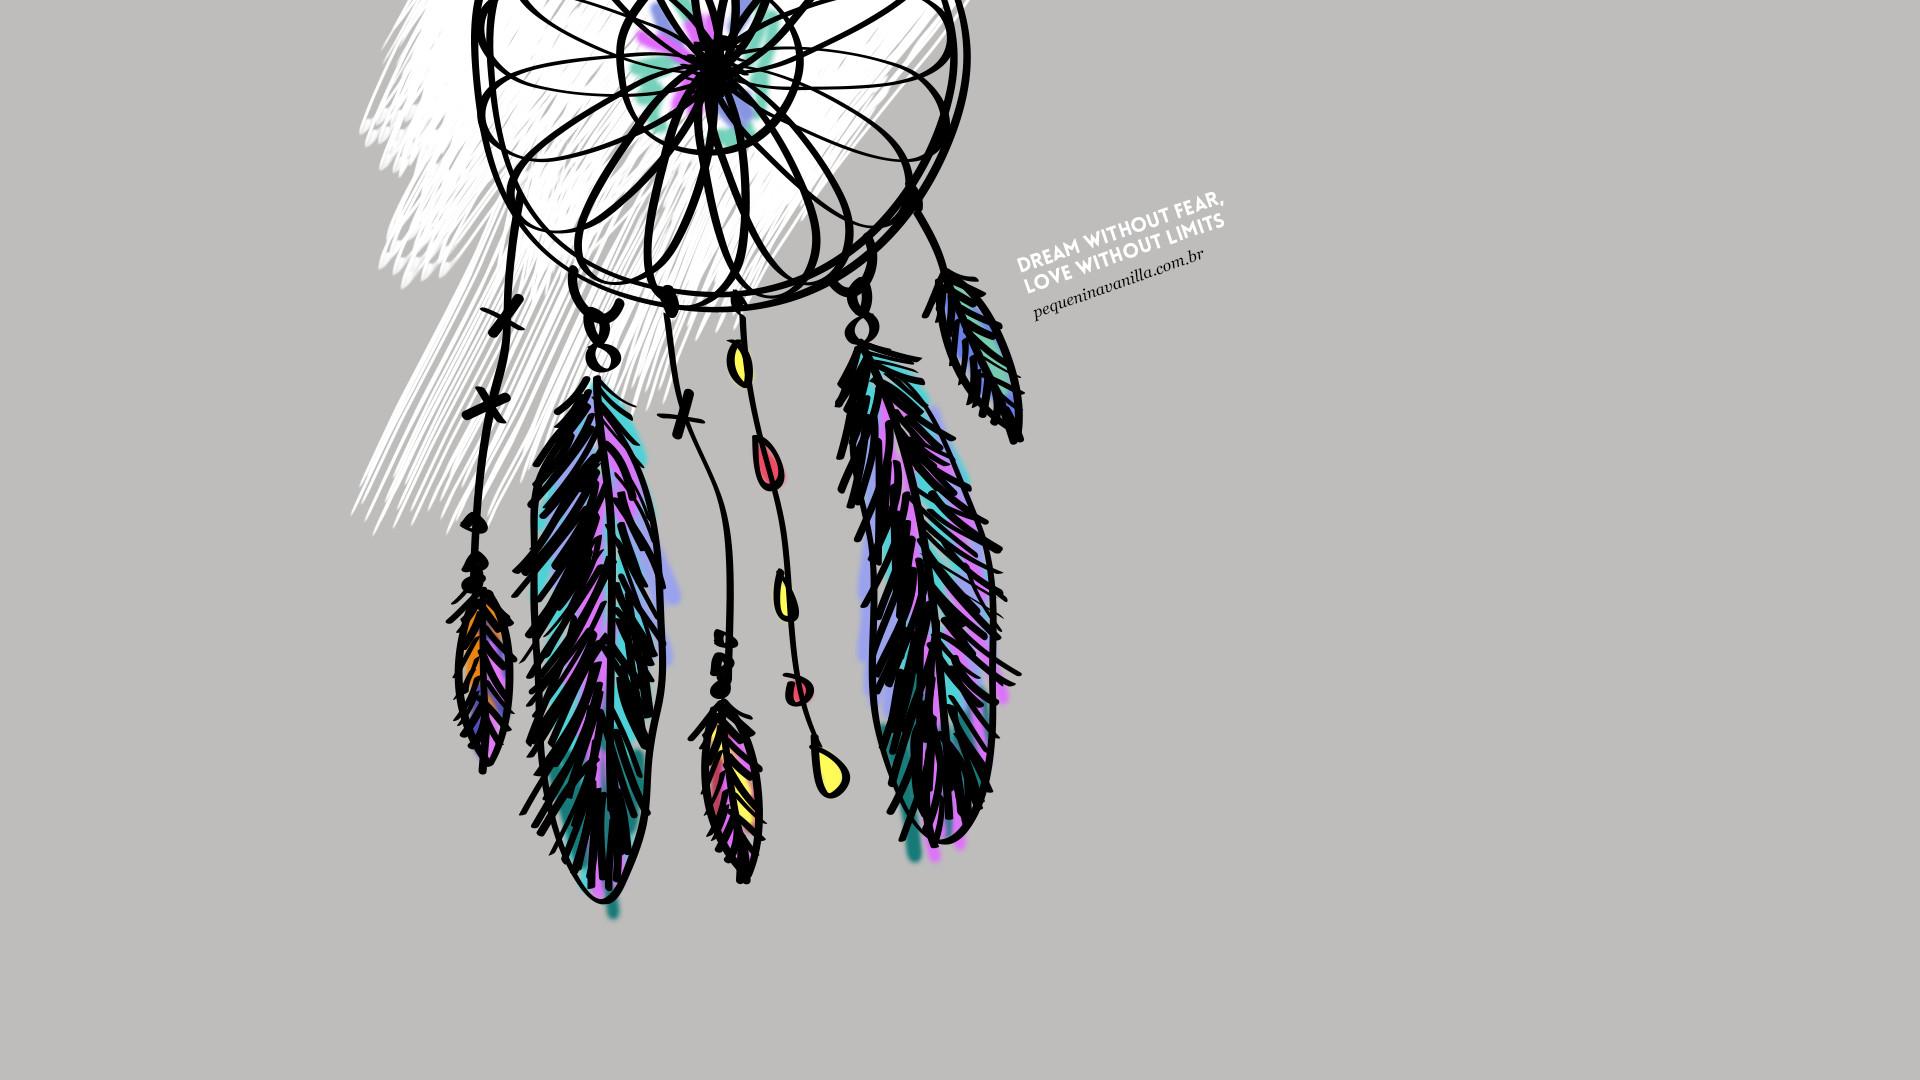 Grey illustrated dreamcatcher Dream Love desktop wallpaper background |  iPhone and desktop wallpapers | Pinterest | Wallpaper backgrounds and  Wallpaper